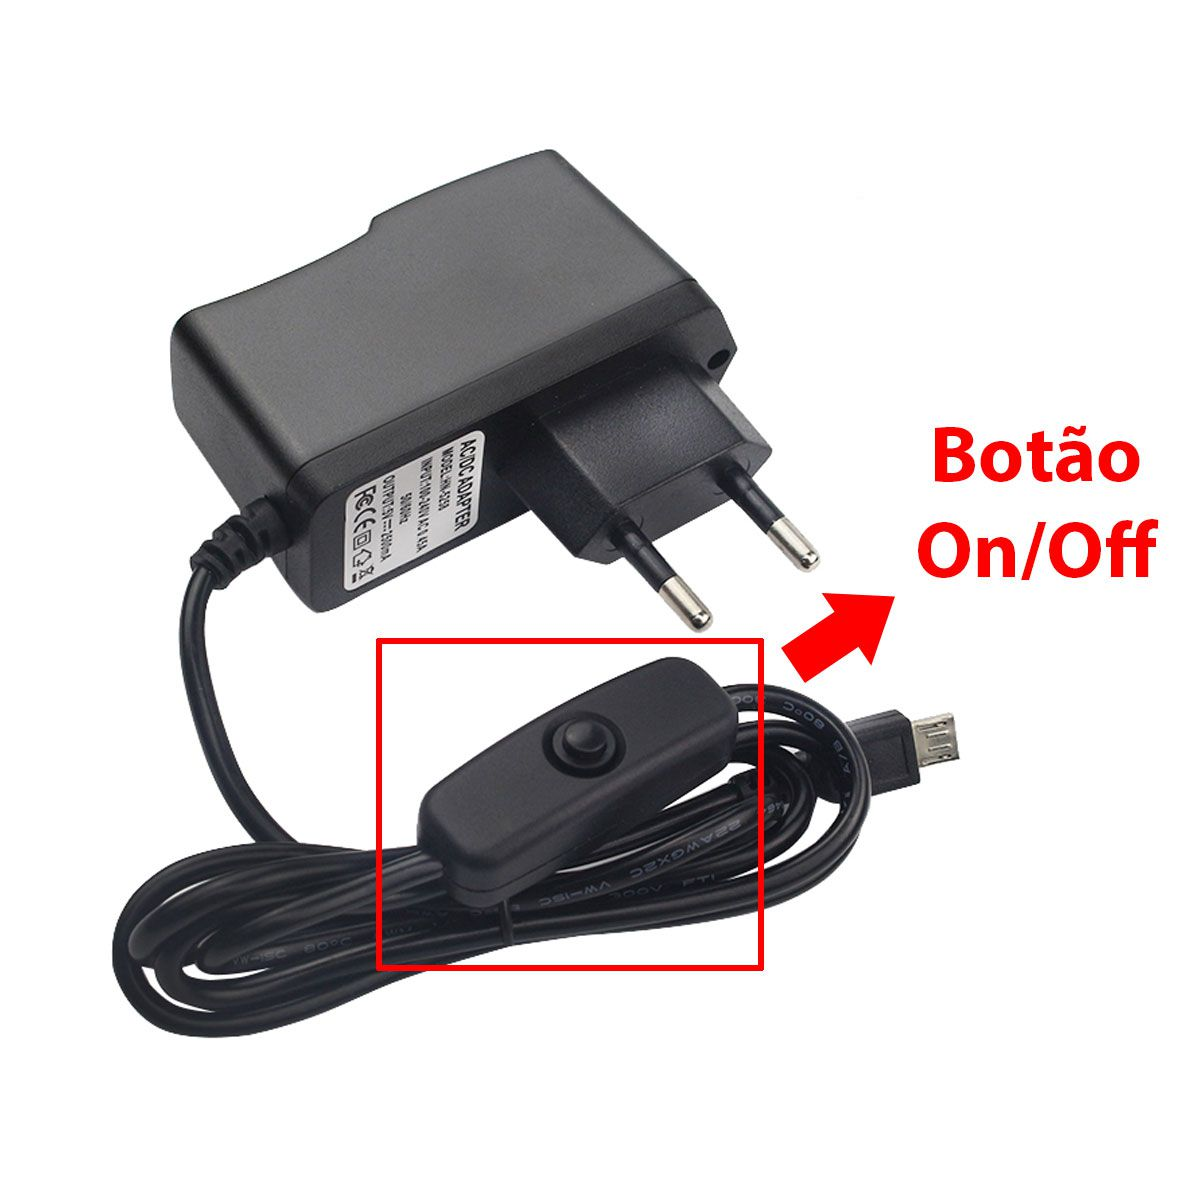 Fonte Raspberry Pi DC Chaveada 5v 2.5A Bivolt Plug Micro USB